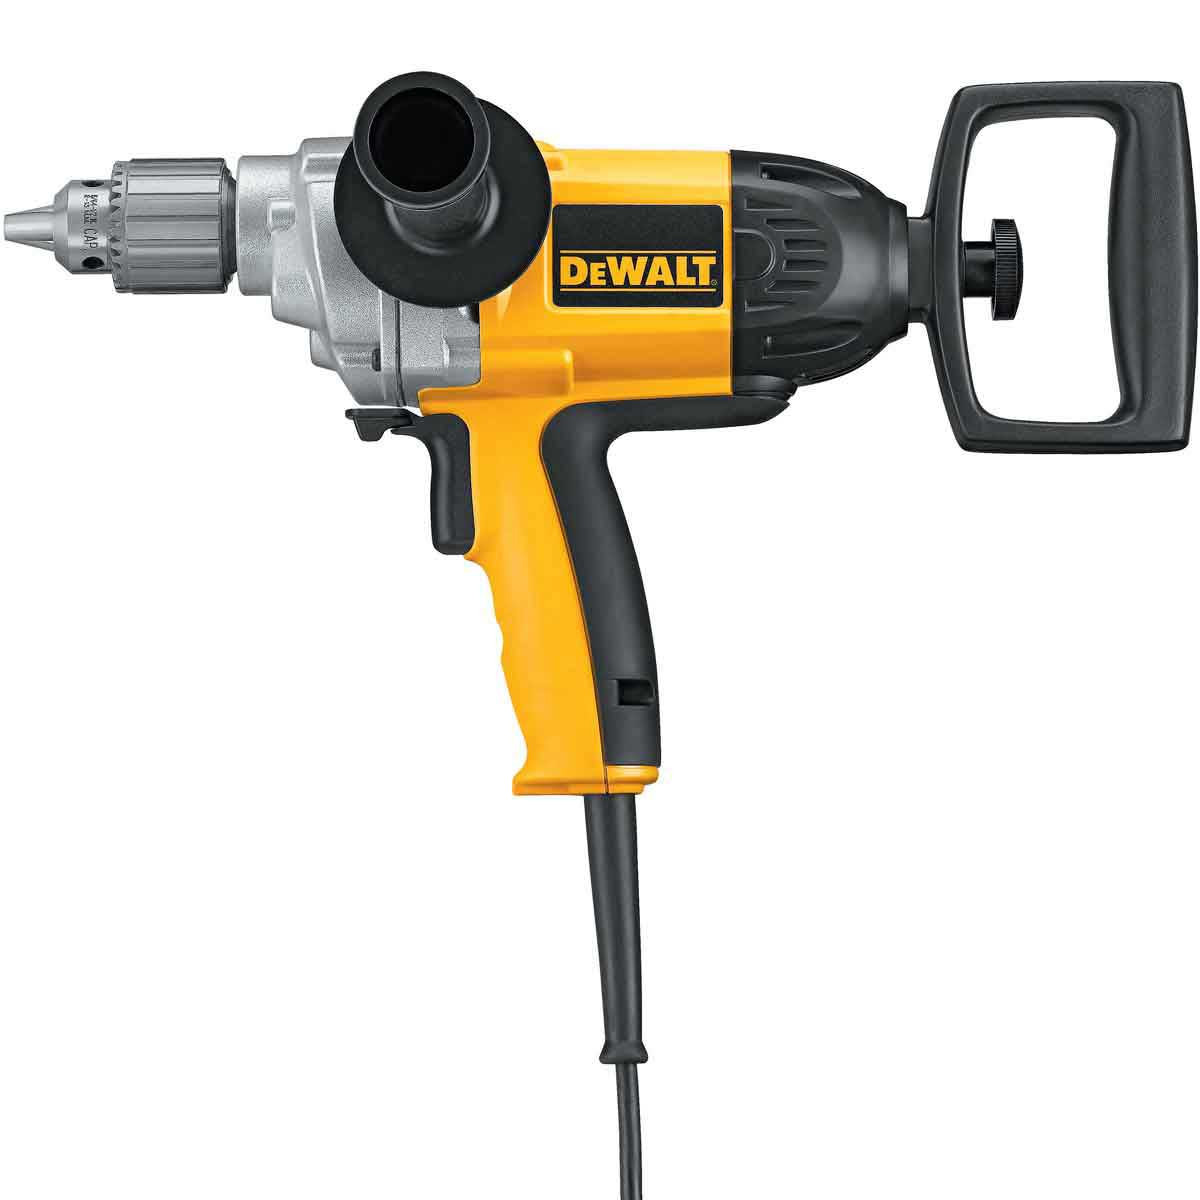 DW130V Dewalt 1/2 mixing drill